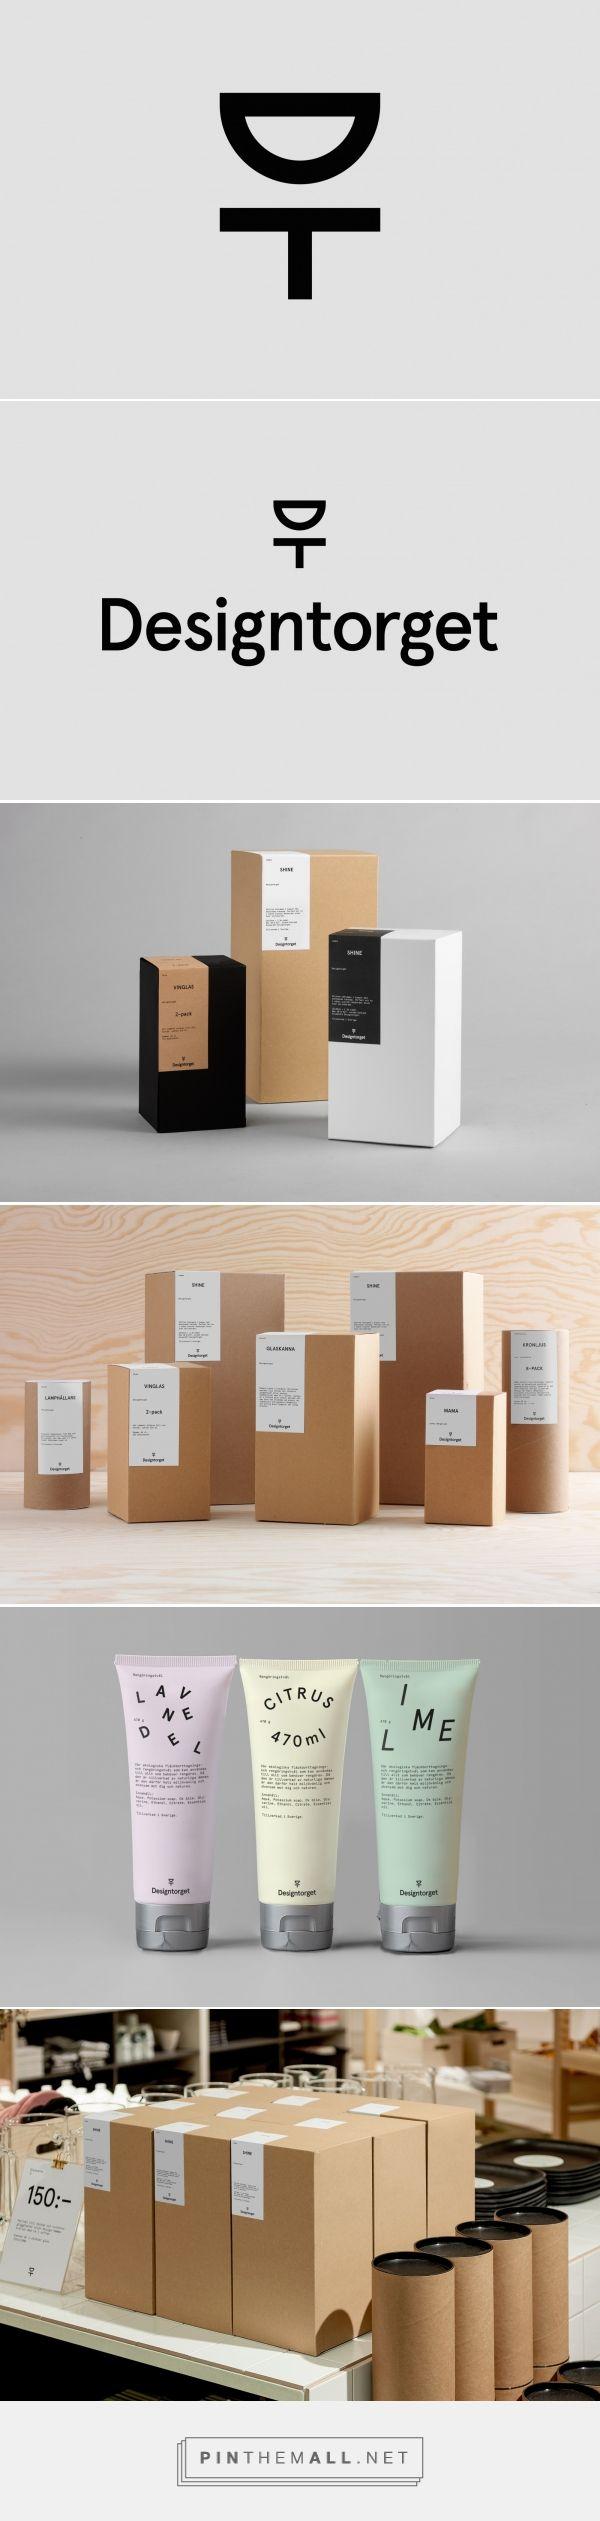 best シャンプー images on pinterest design packaging packaging